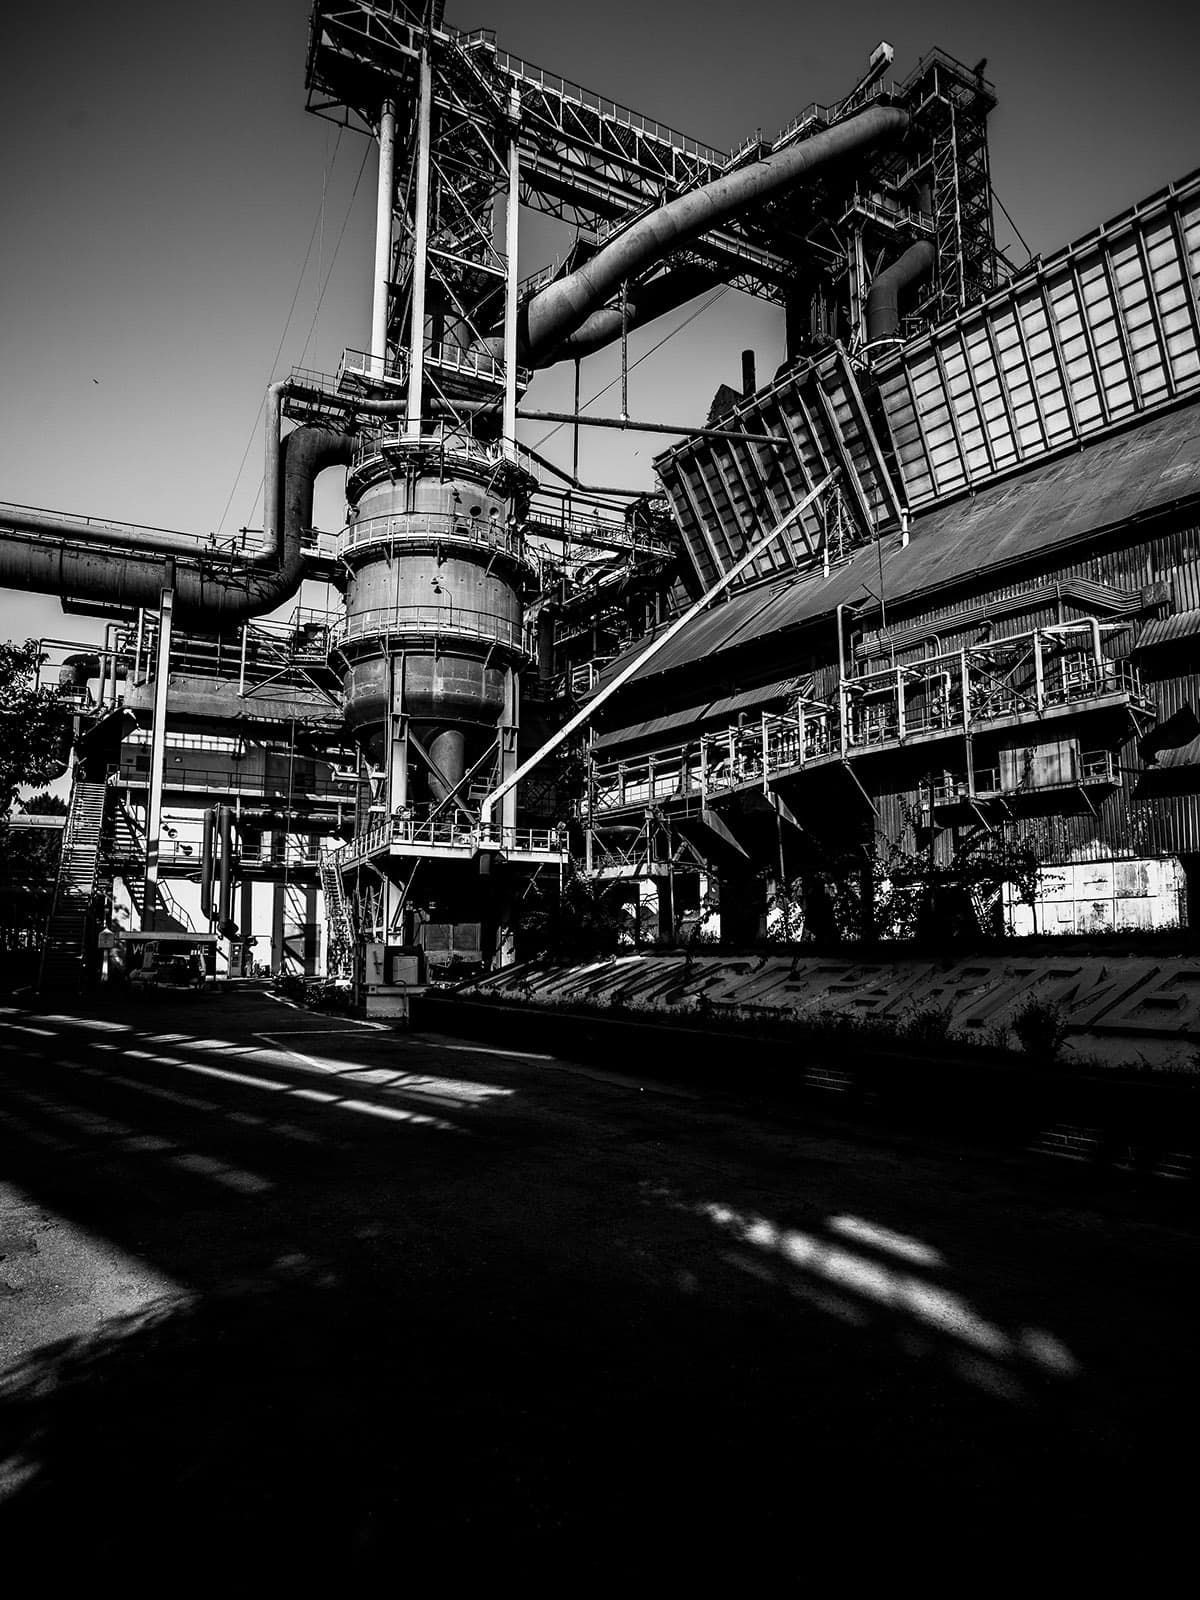 Inside the iron making department of Pakistan Steel Mills